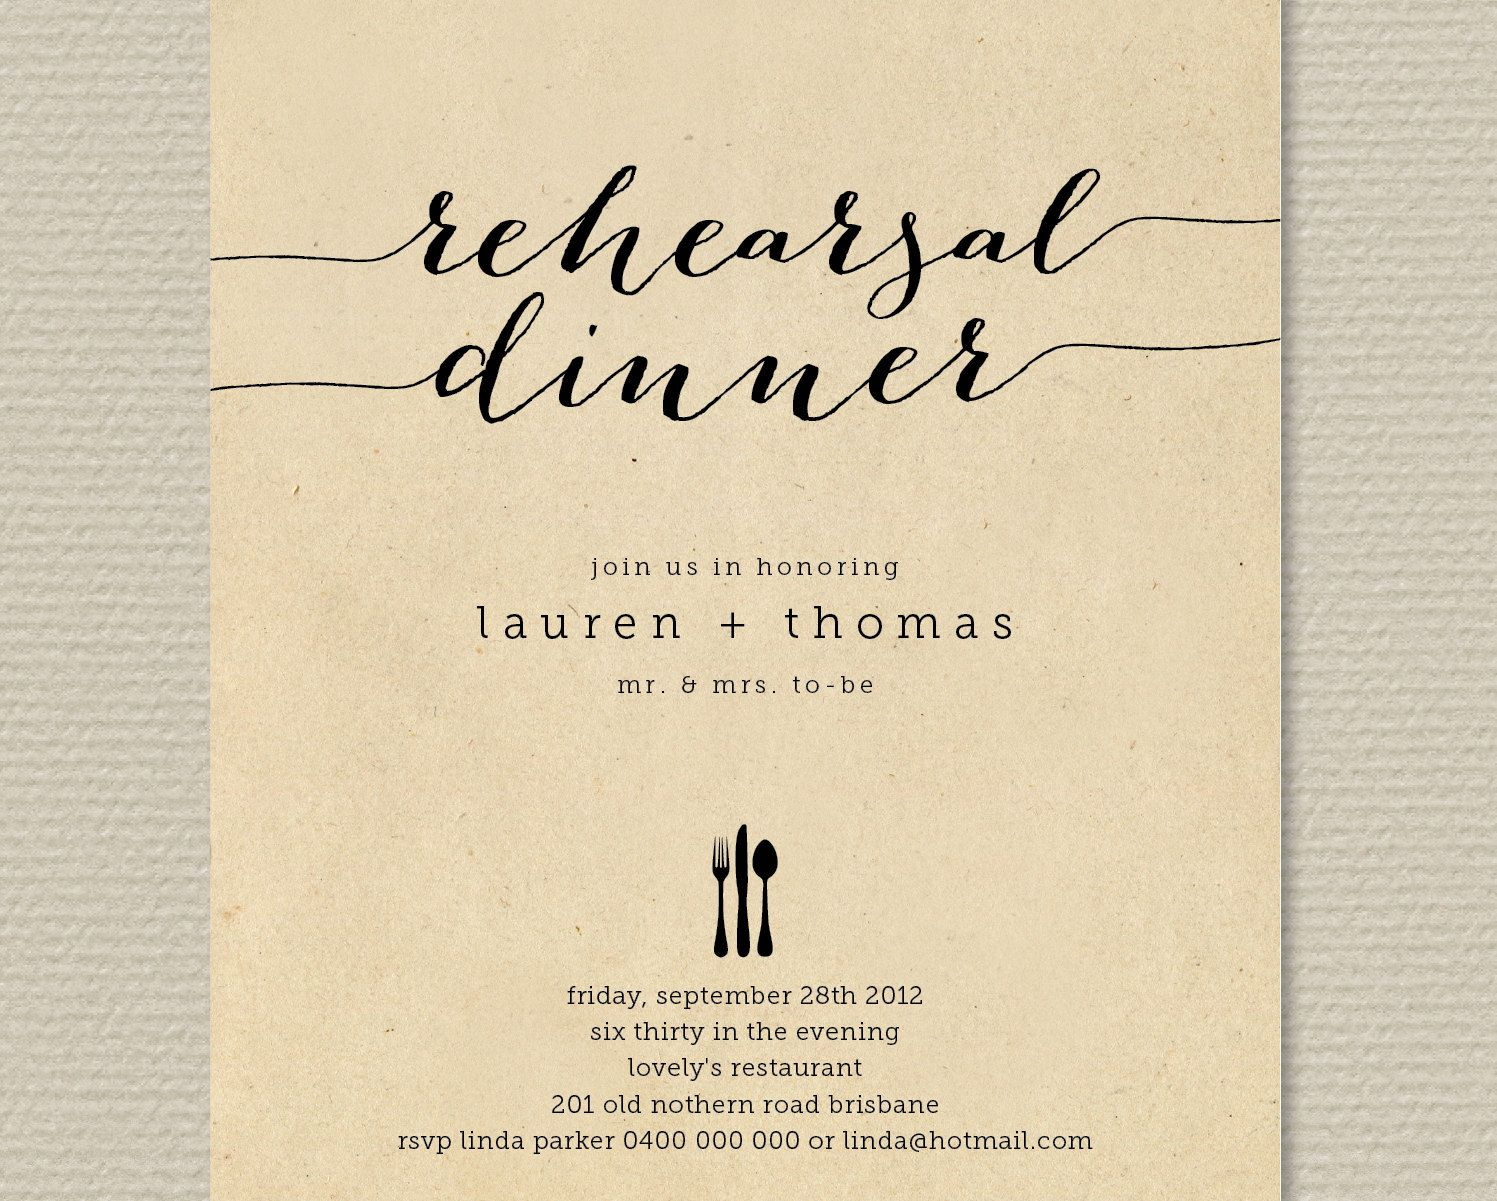 dinner invitation background